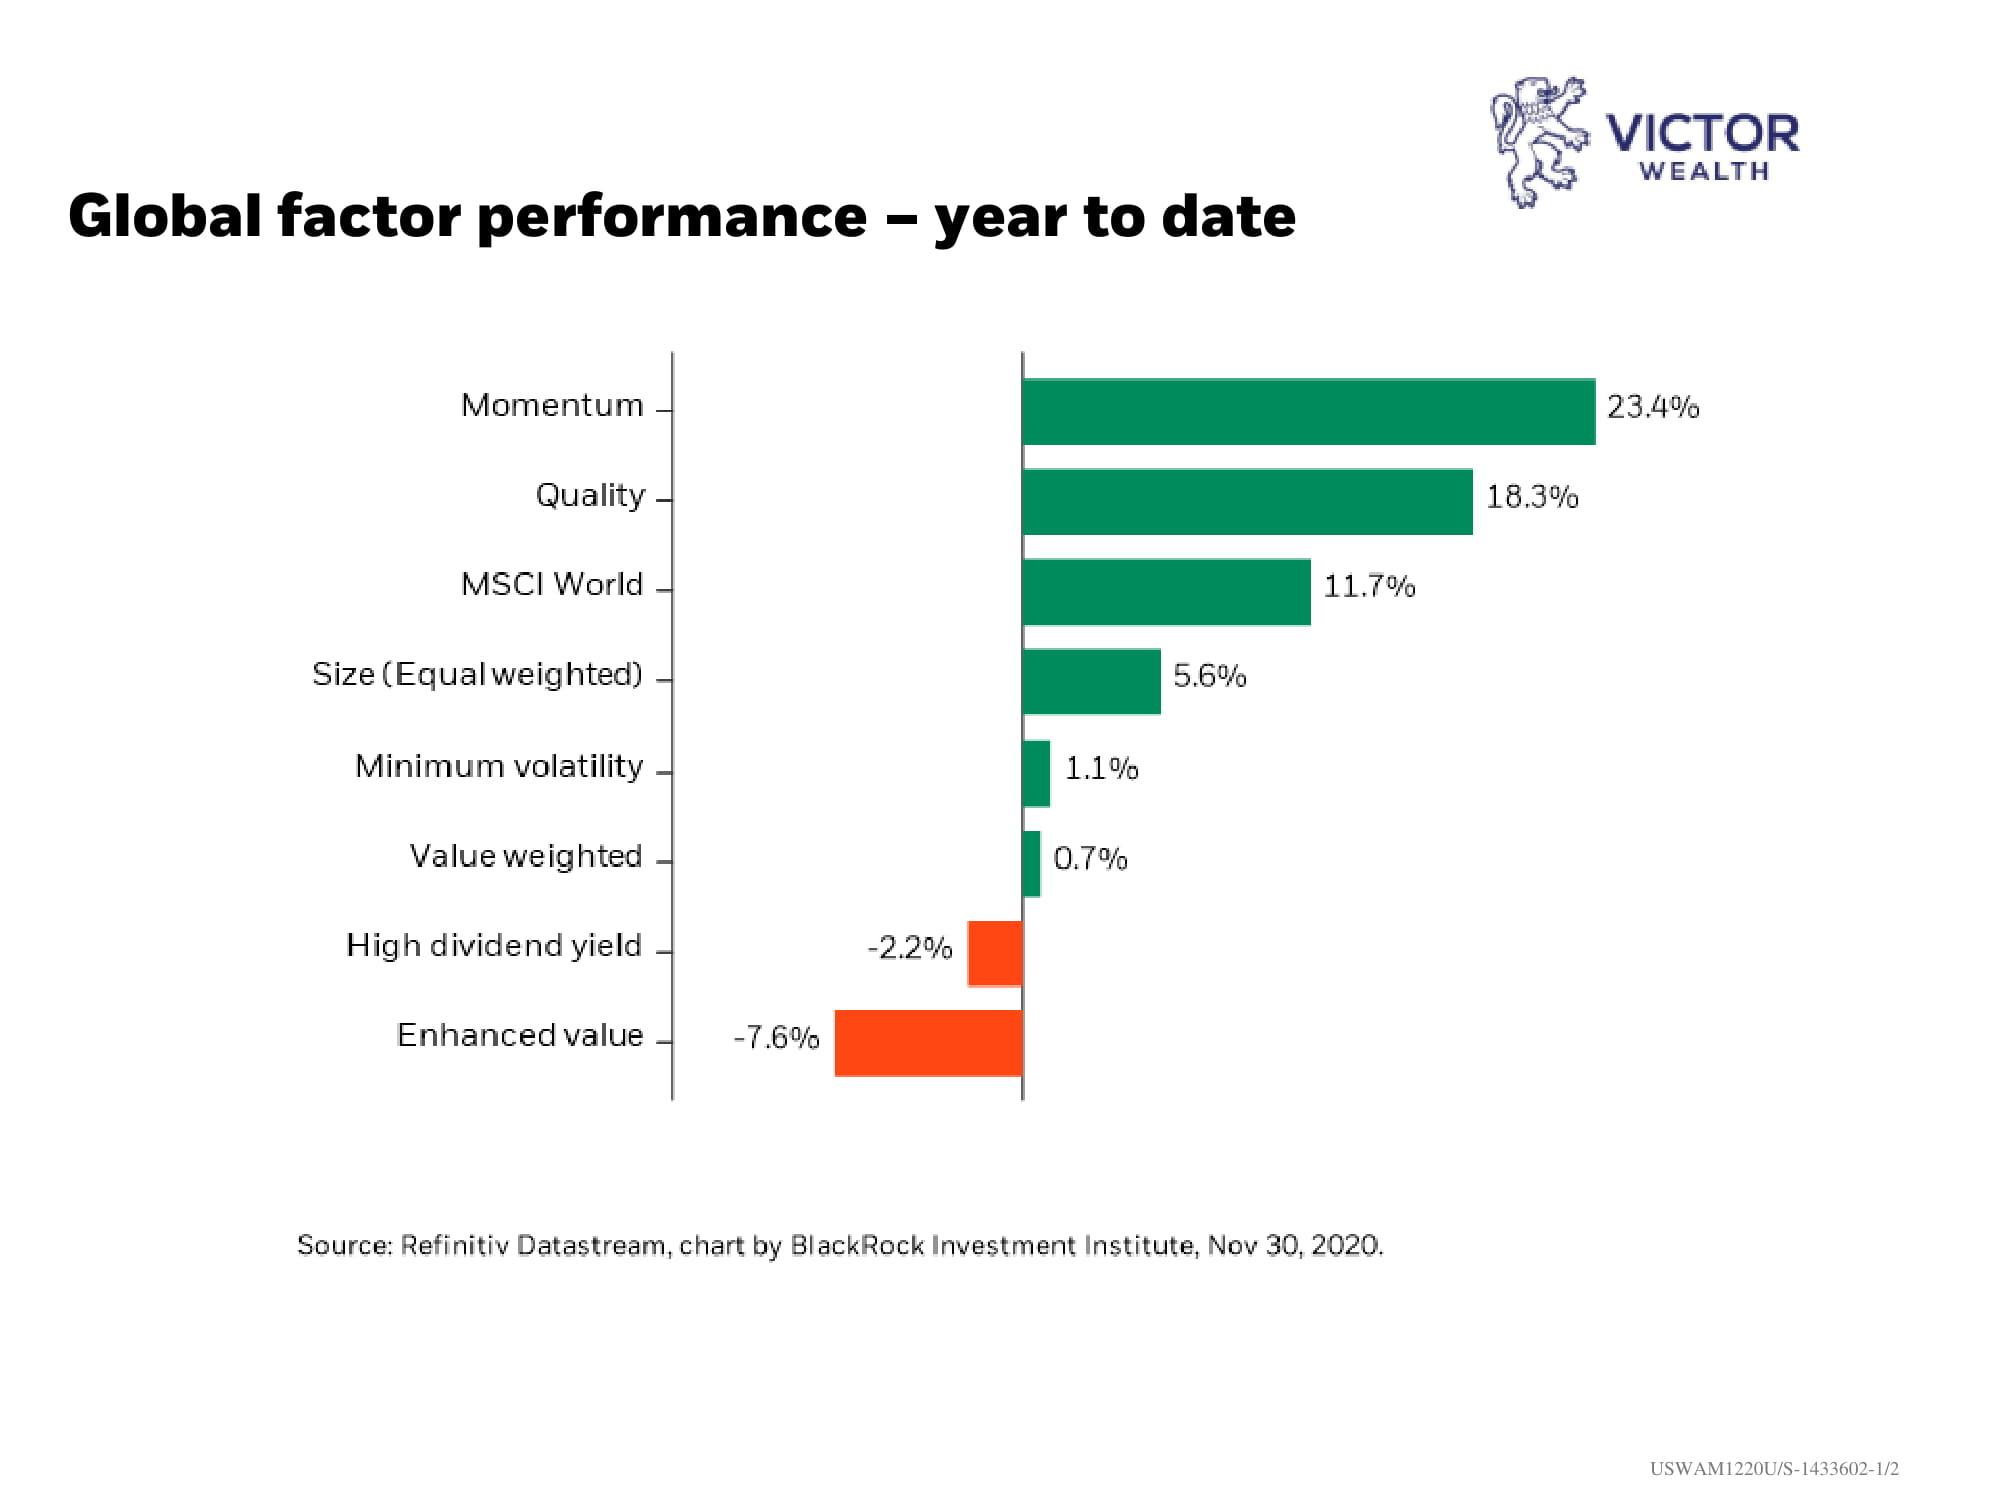 Global Factor Performance Chart